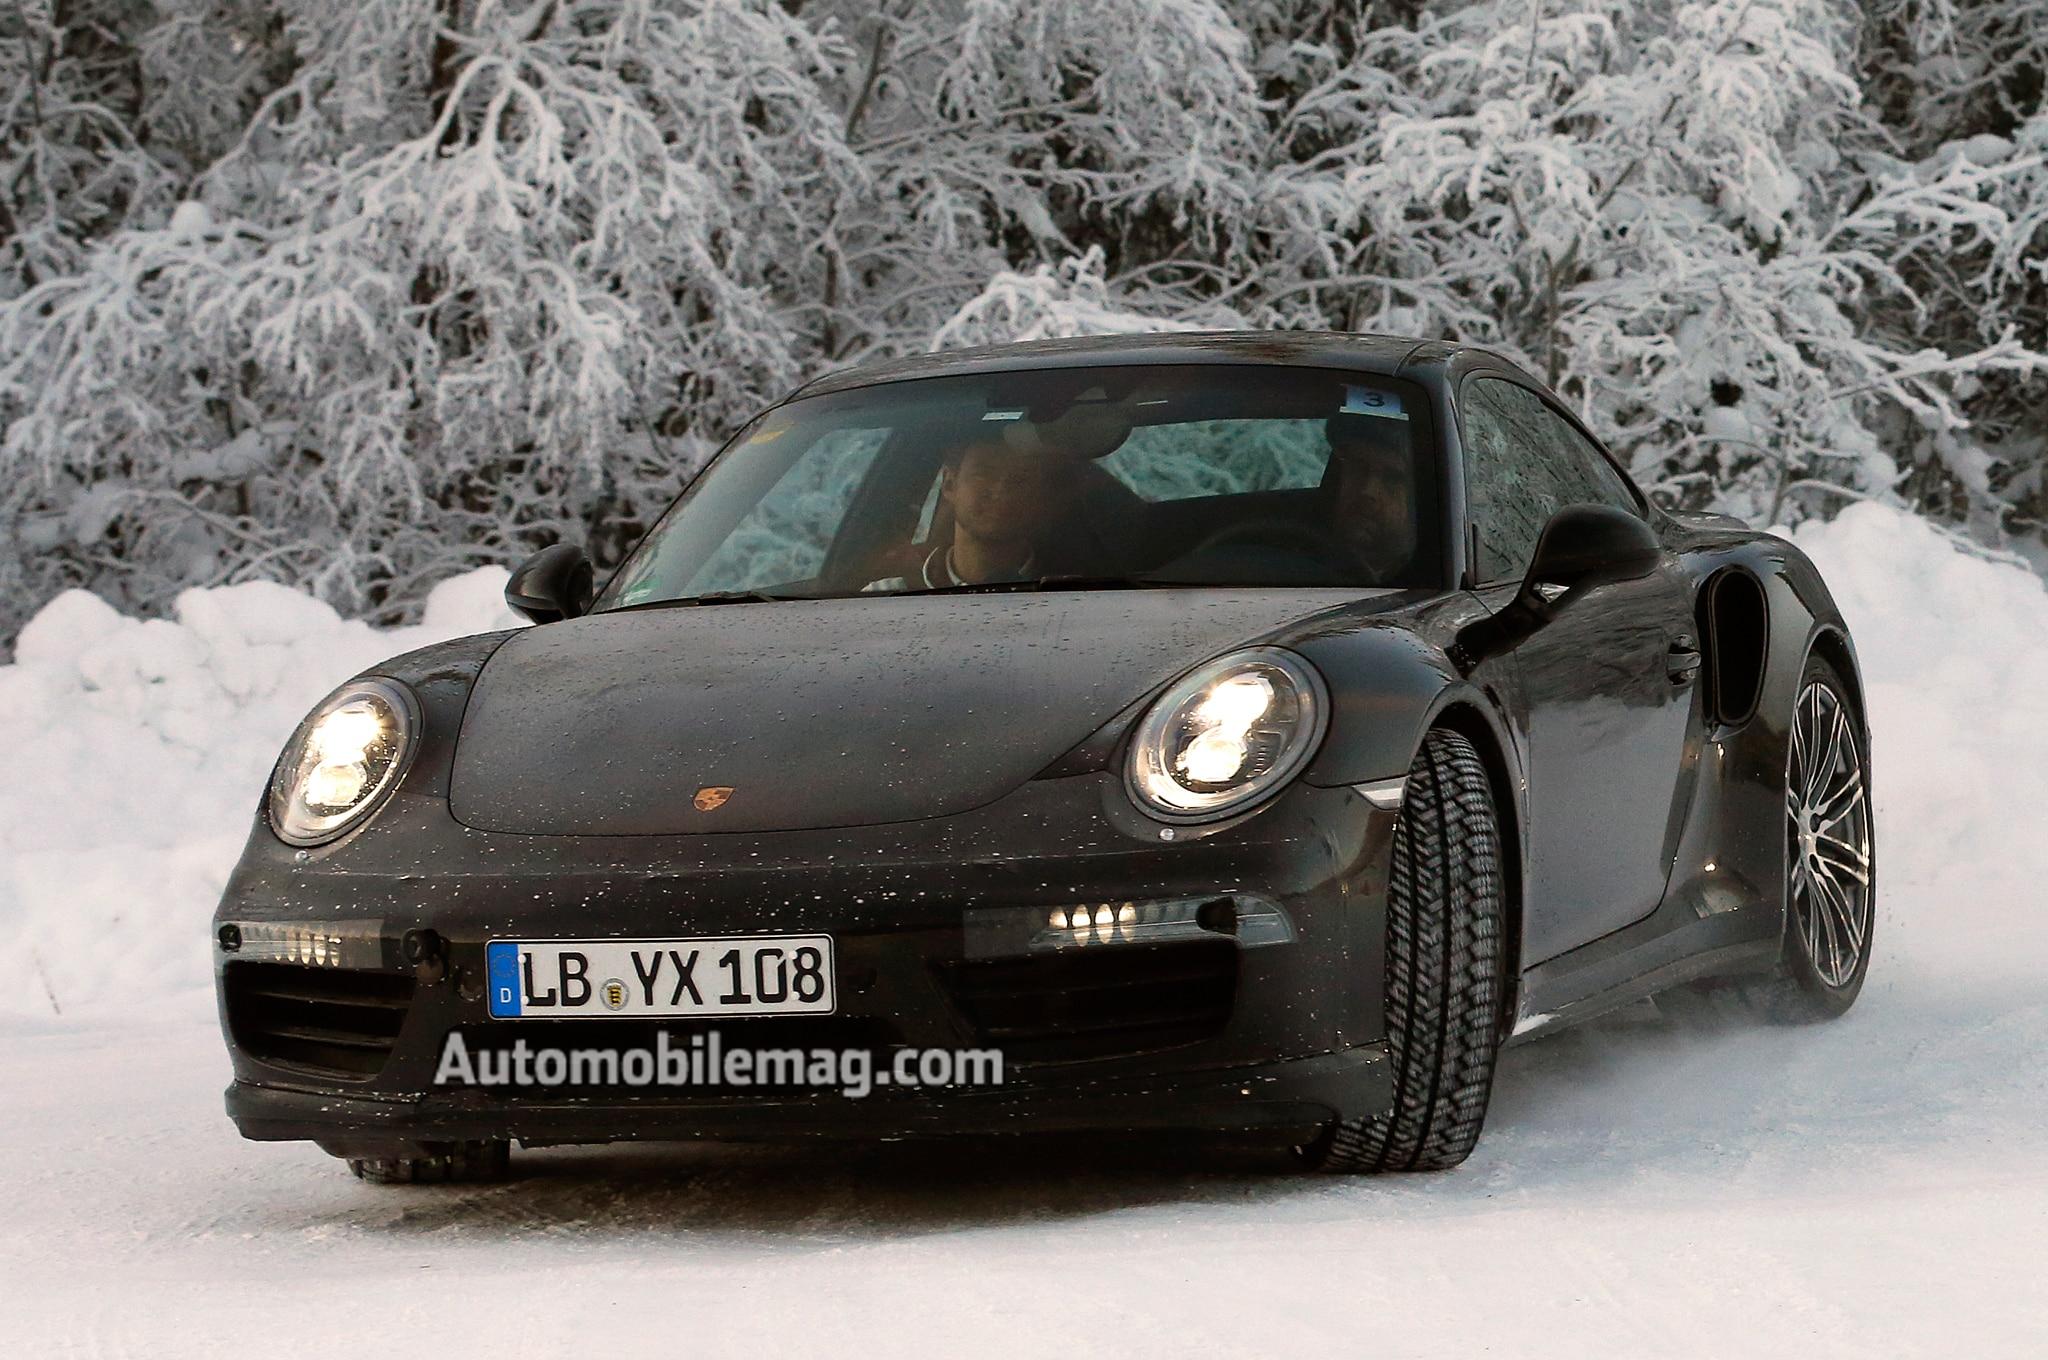 2016 Porsche 911 Turbo Left Front Angle